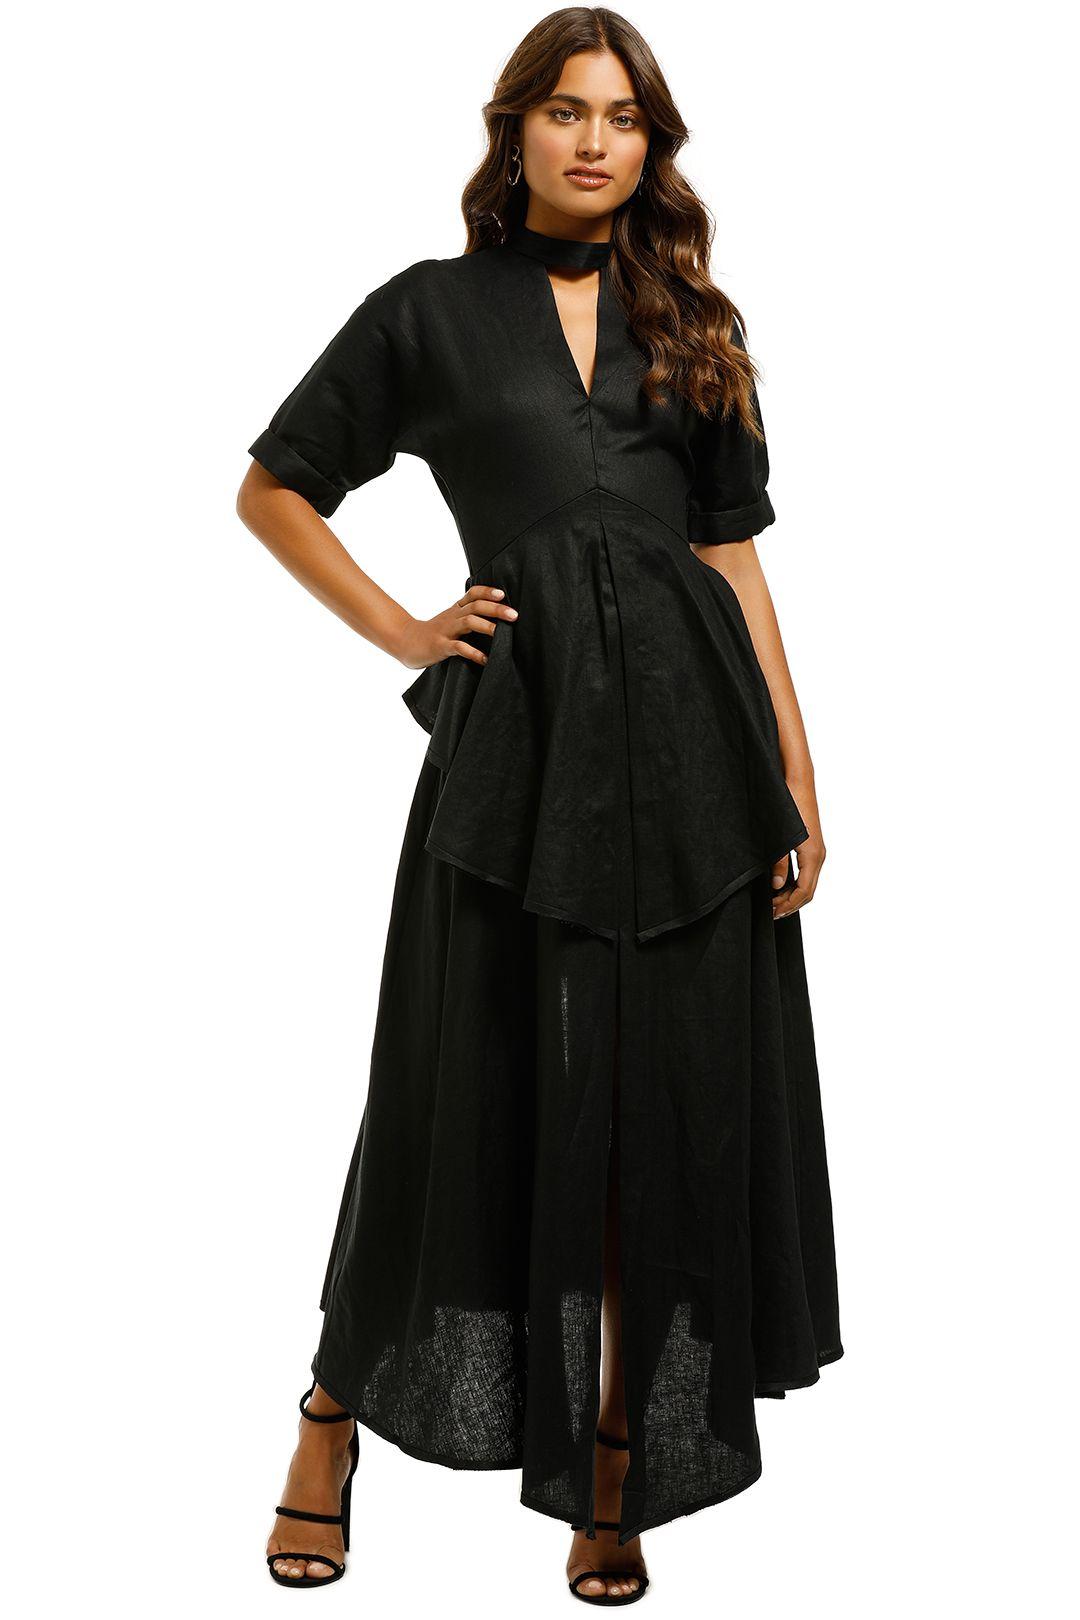 KITX-Anthropocene-Two-Way-Dress-Black-Front